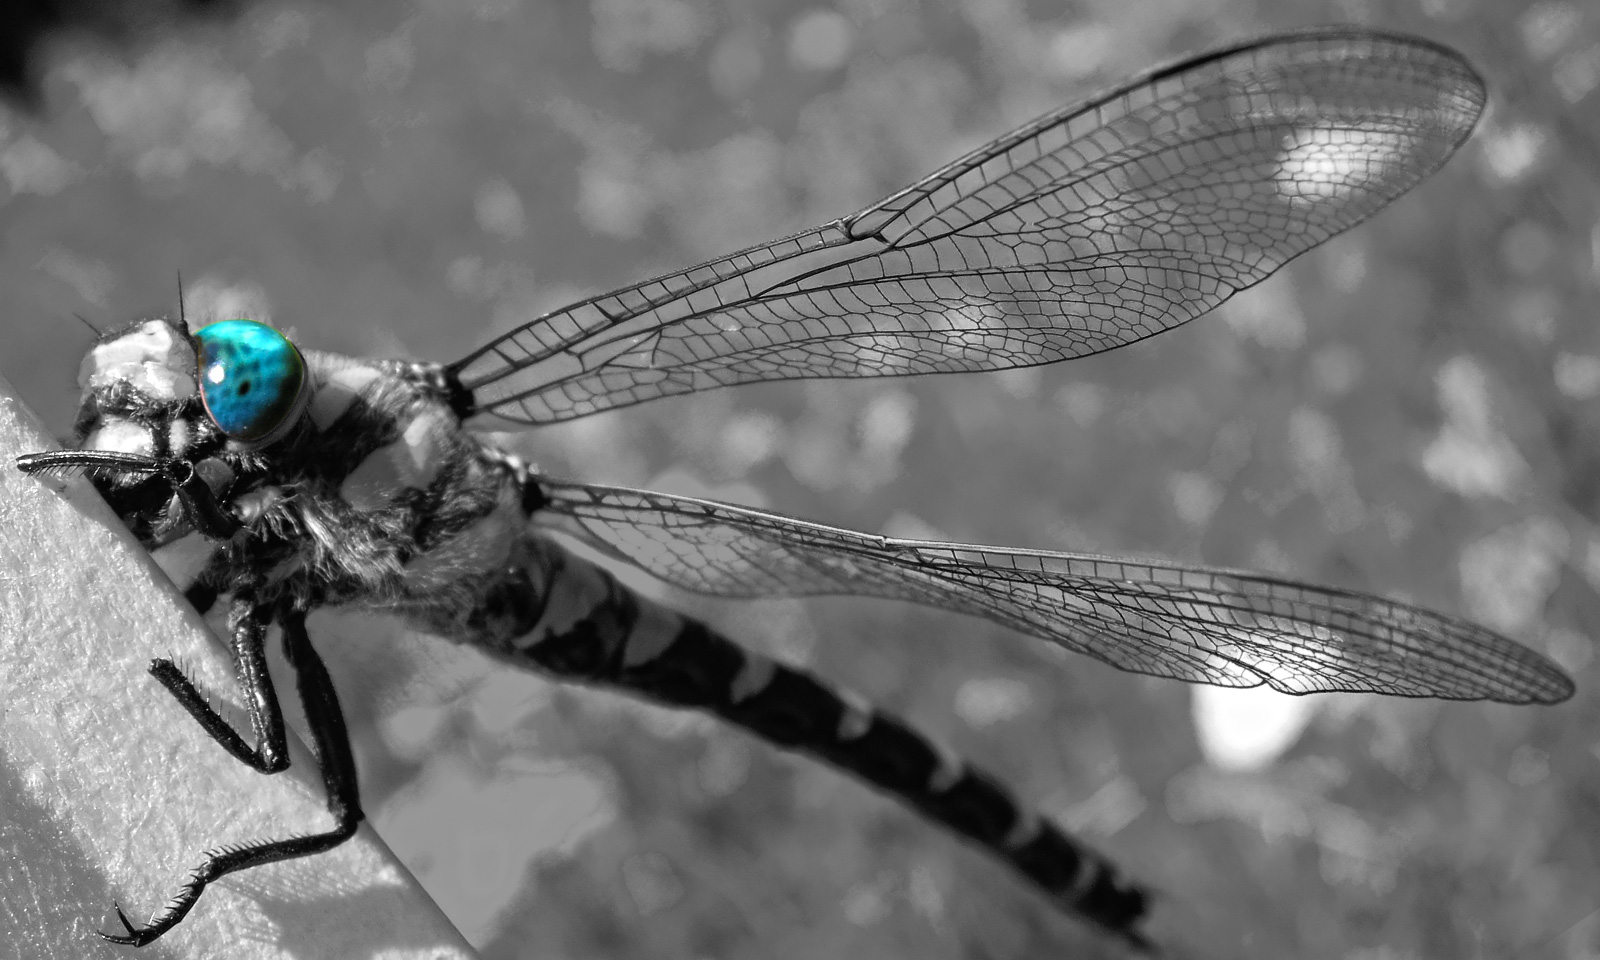 Dragonfly | Yusufçuk